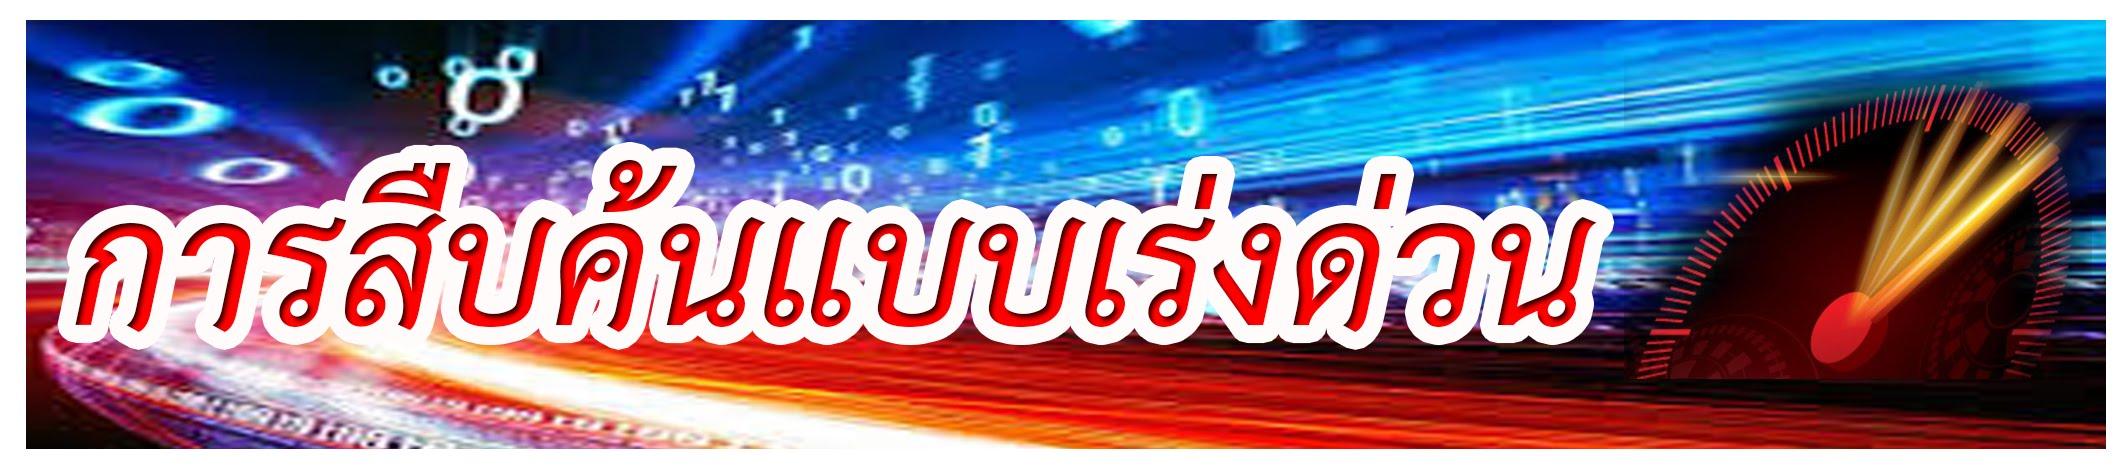 https://sites.google.com/a/wr.ac.th/chatreewr/home/subkhn-baeb-reng-dwn